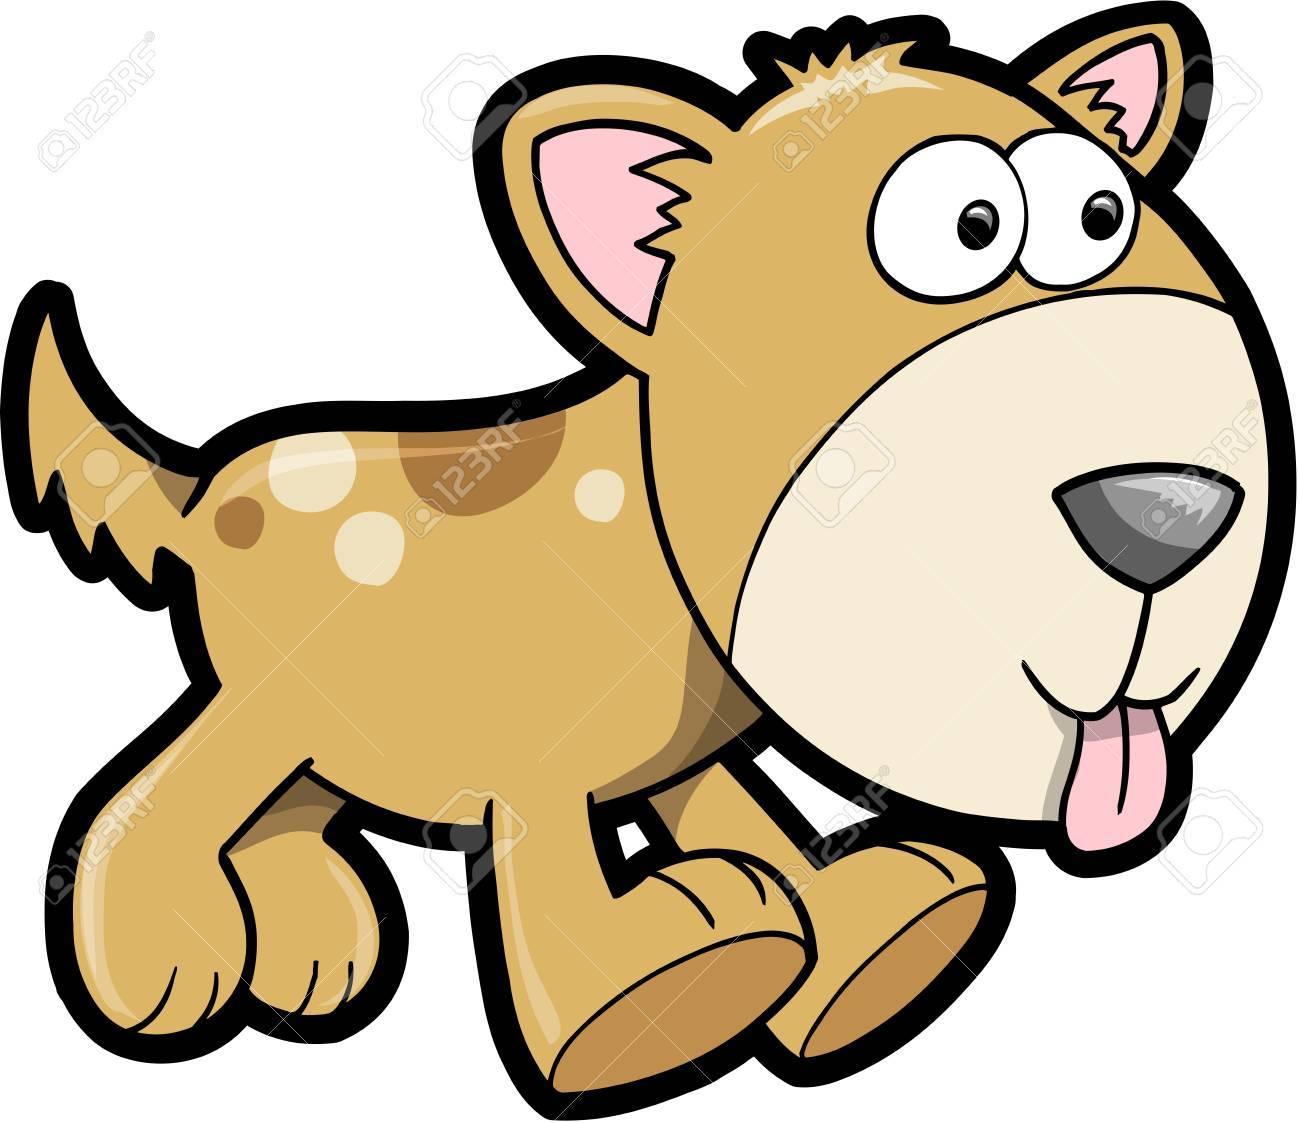 Happy Puppy Dog Animal Vector Illustration Art Stock Vector - 12413998